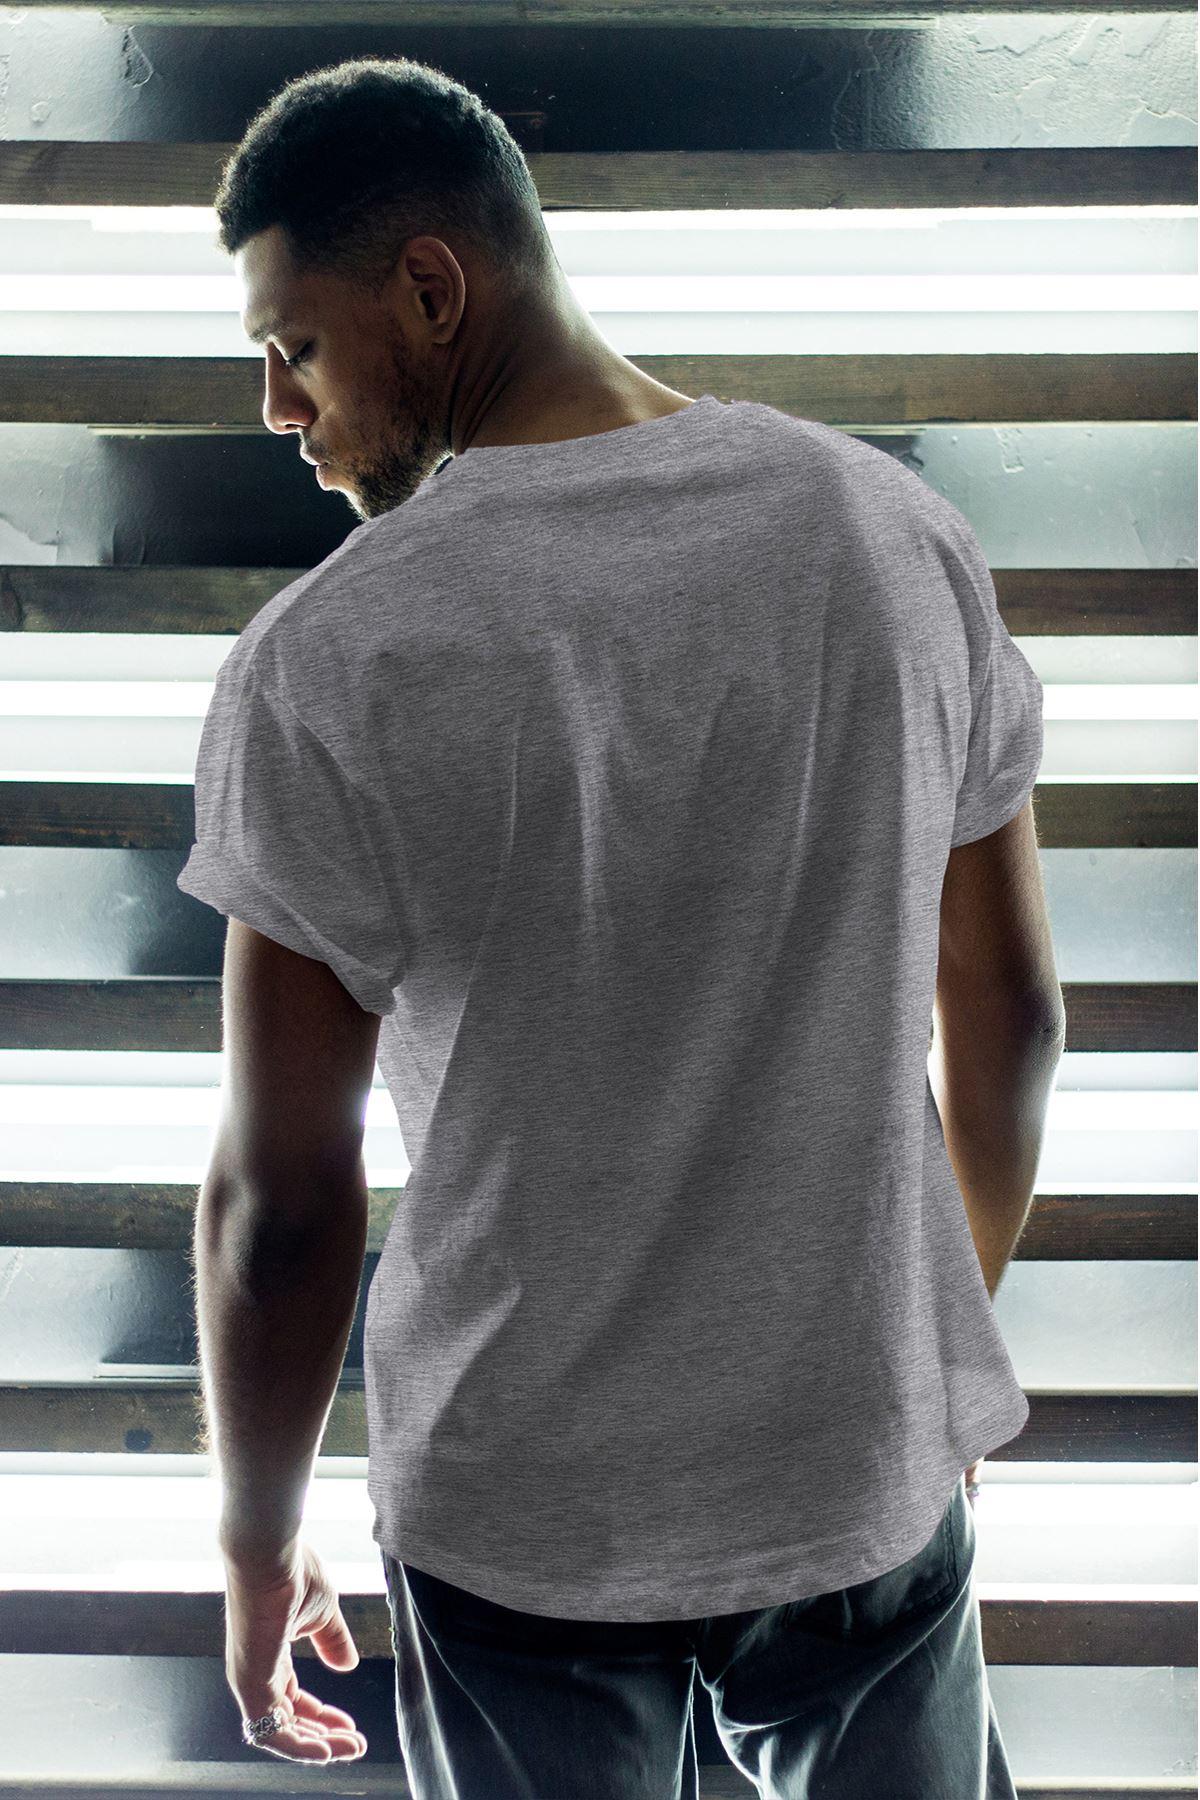 Anime Death Note 04 Gri Erkek Oversize Tshirt - Tişört